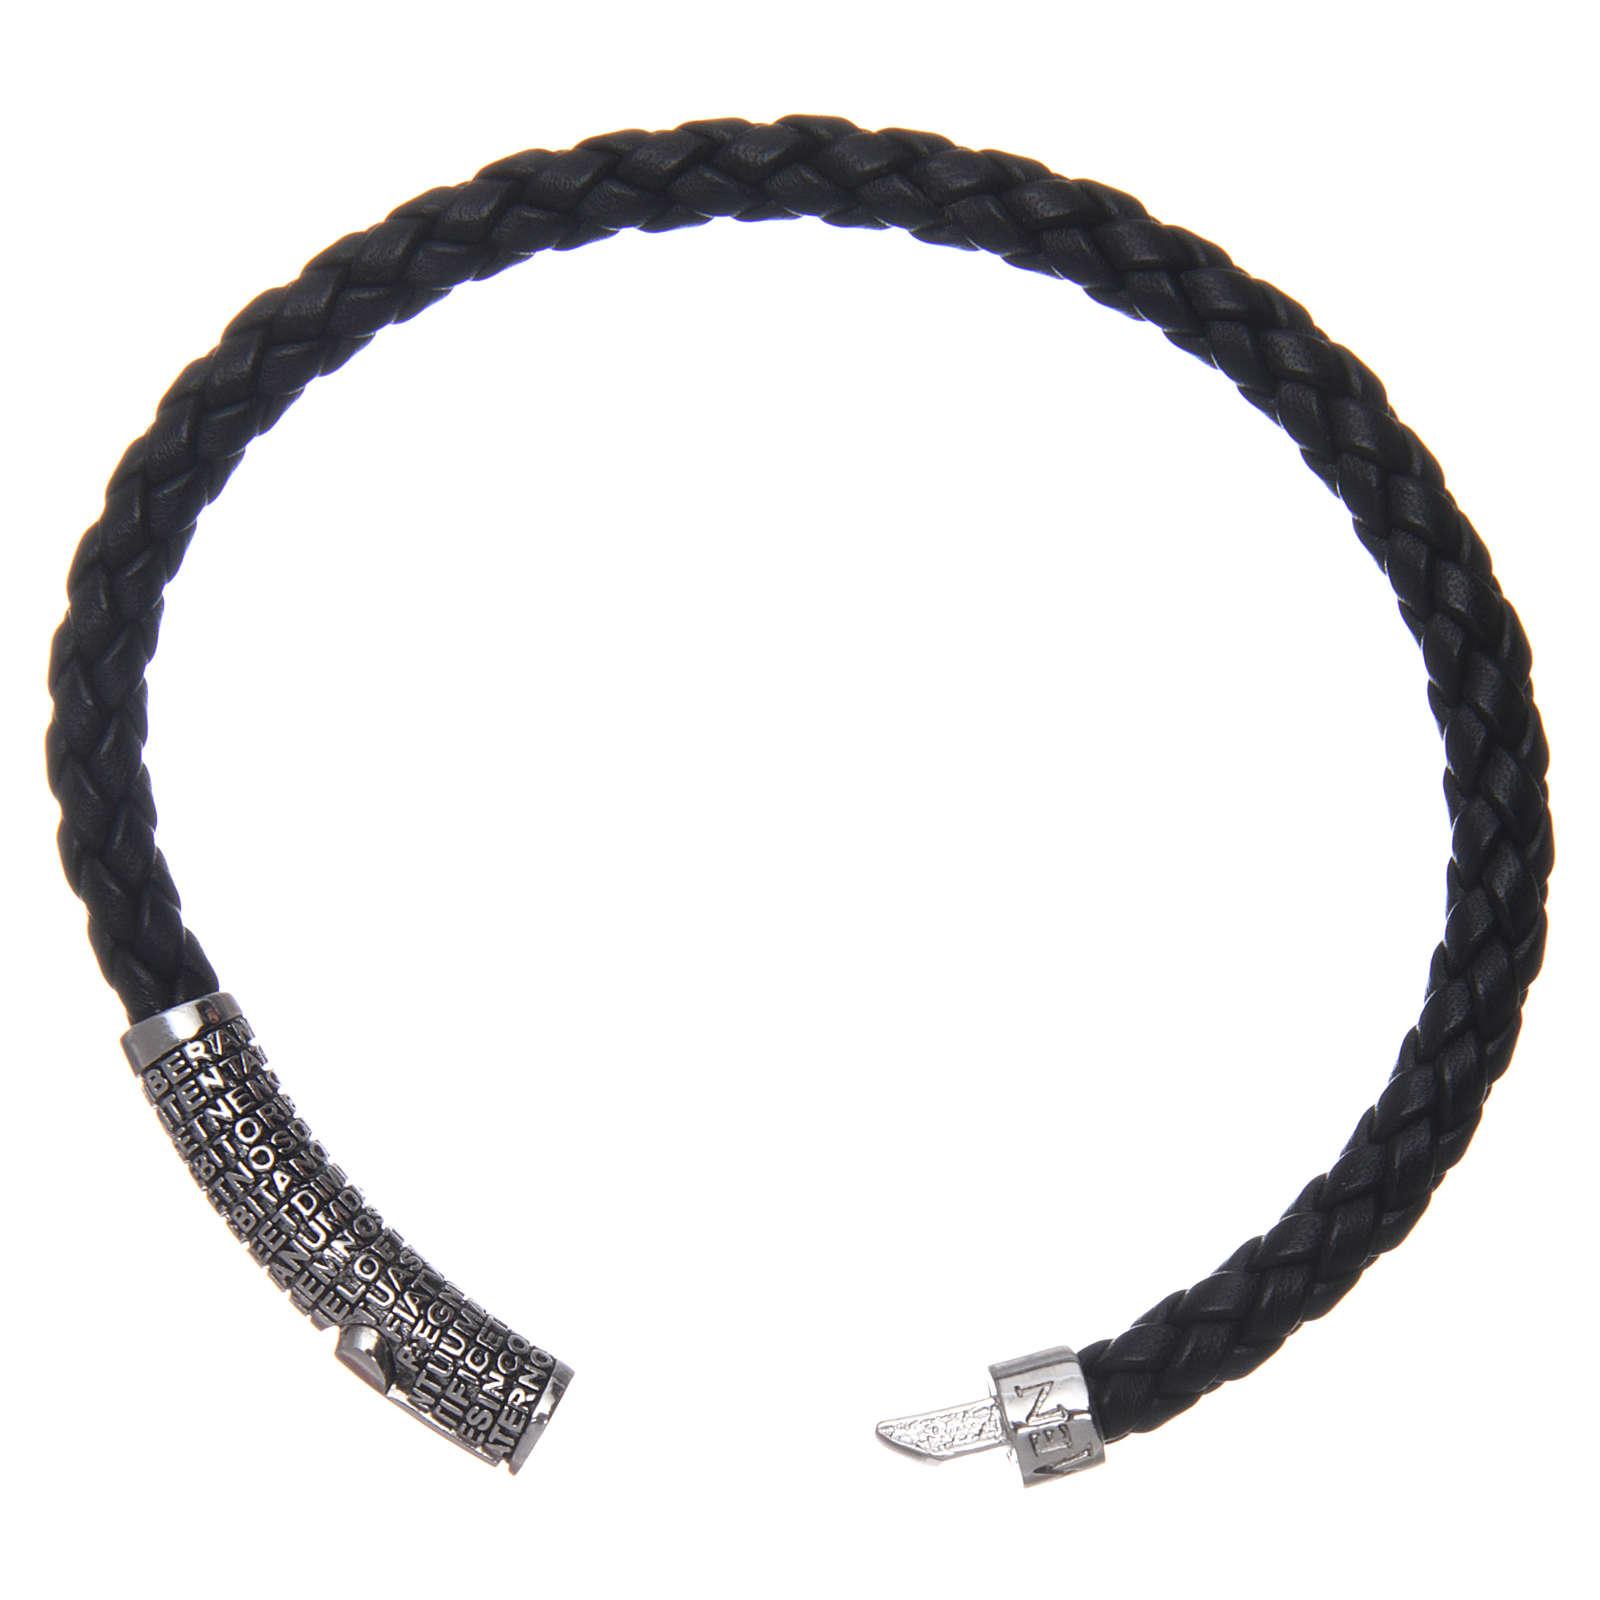 Amen bracelet in black woven leather Pater Noster 4